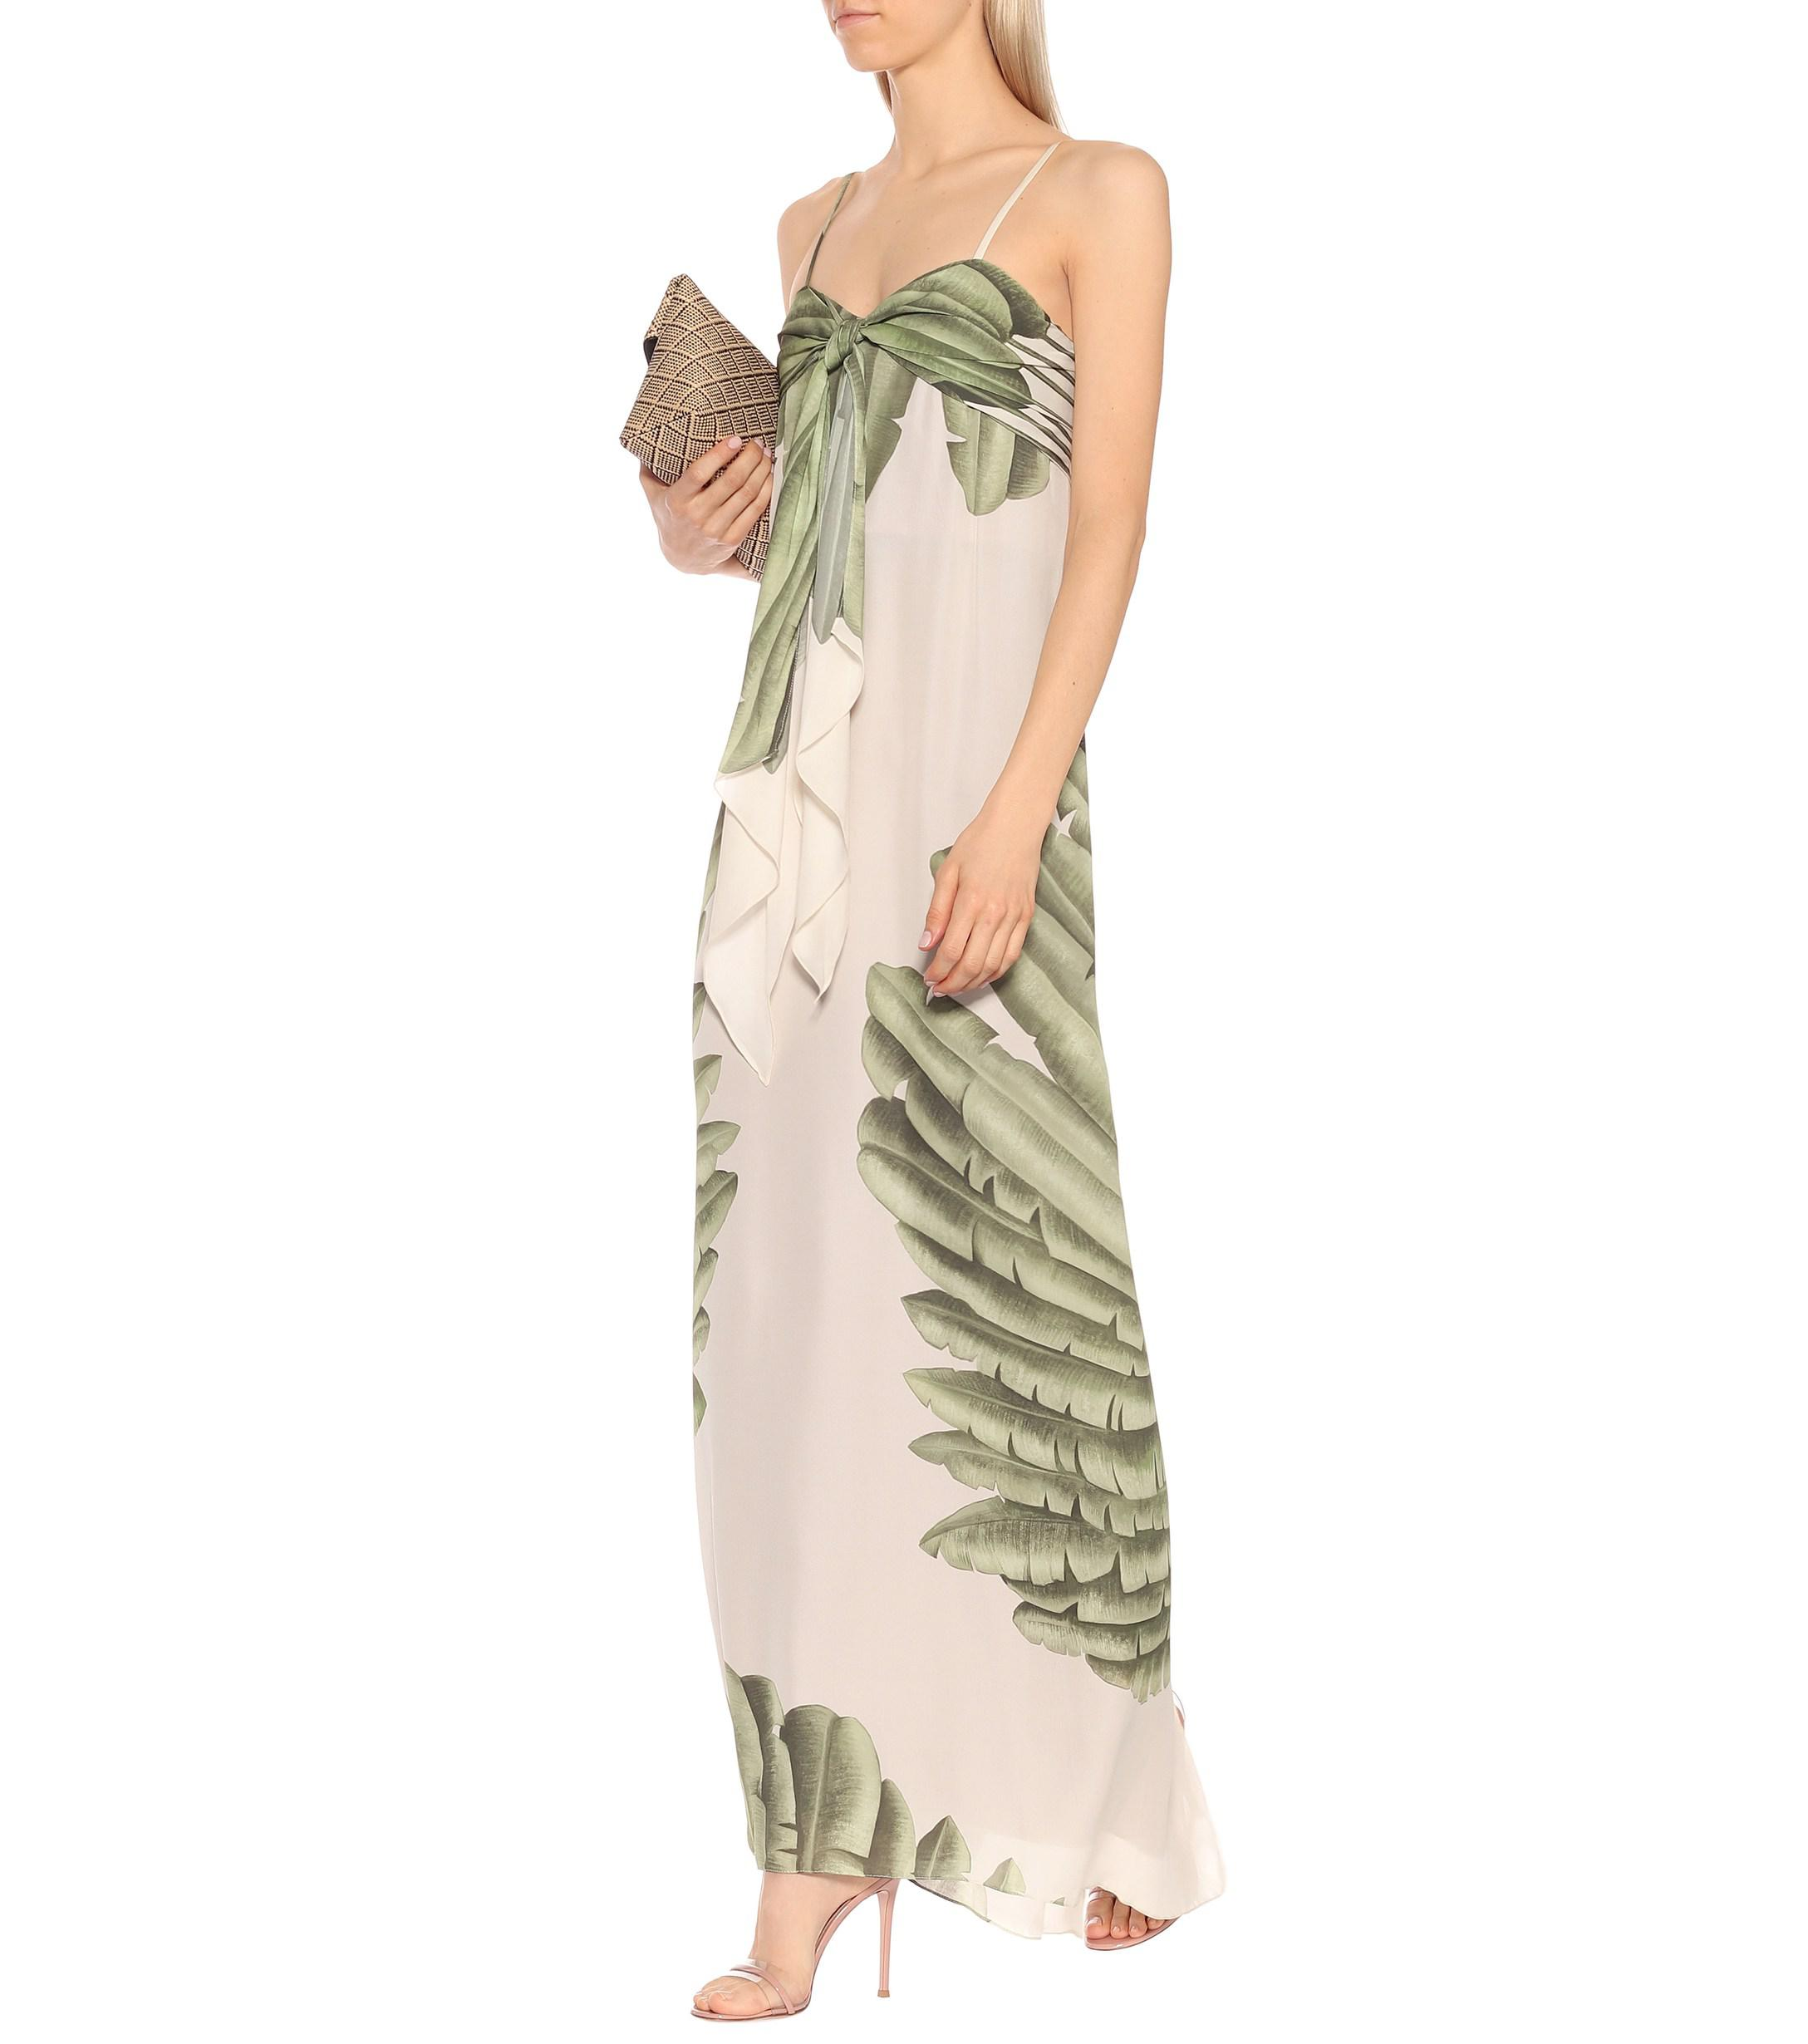 bb9319de141 Johanna Ortiz - Multicolor Palm Tree Print Maxi Dress - Lyst. View  fullscreen